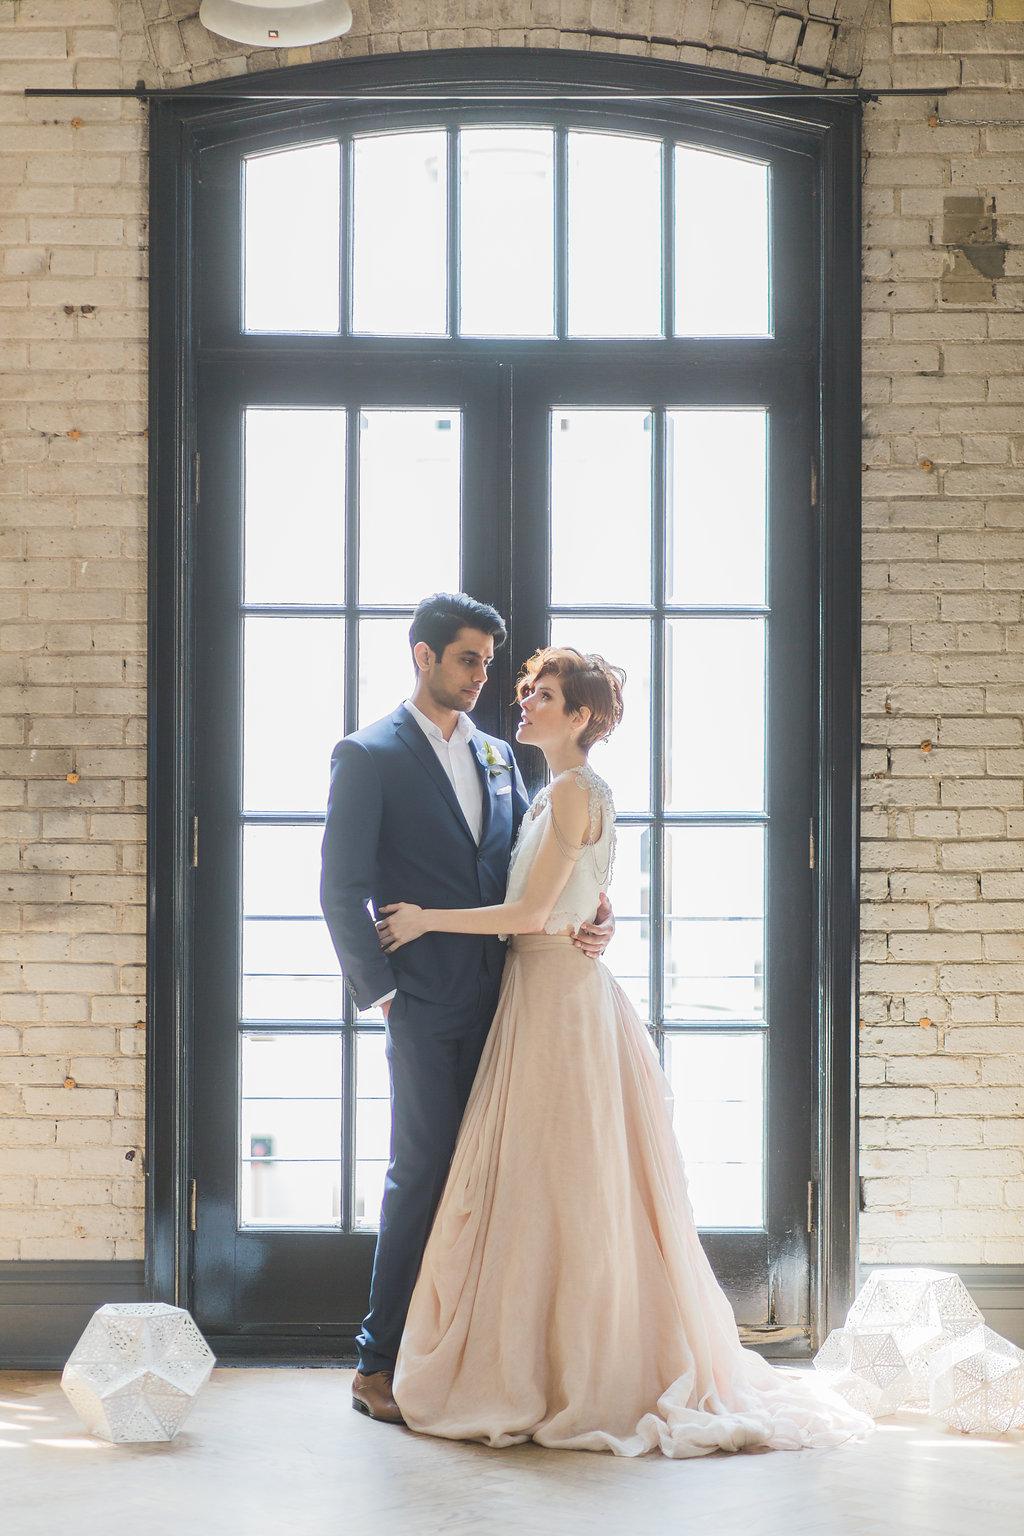 Phoebe Lo Events Toronto Wedding - Storys Building Urban Loft Paper Inspired Wedding 015.jpg